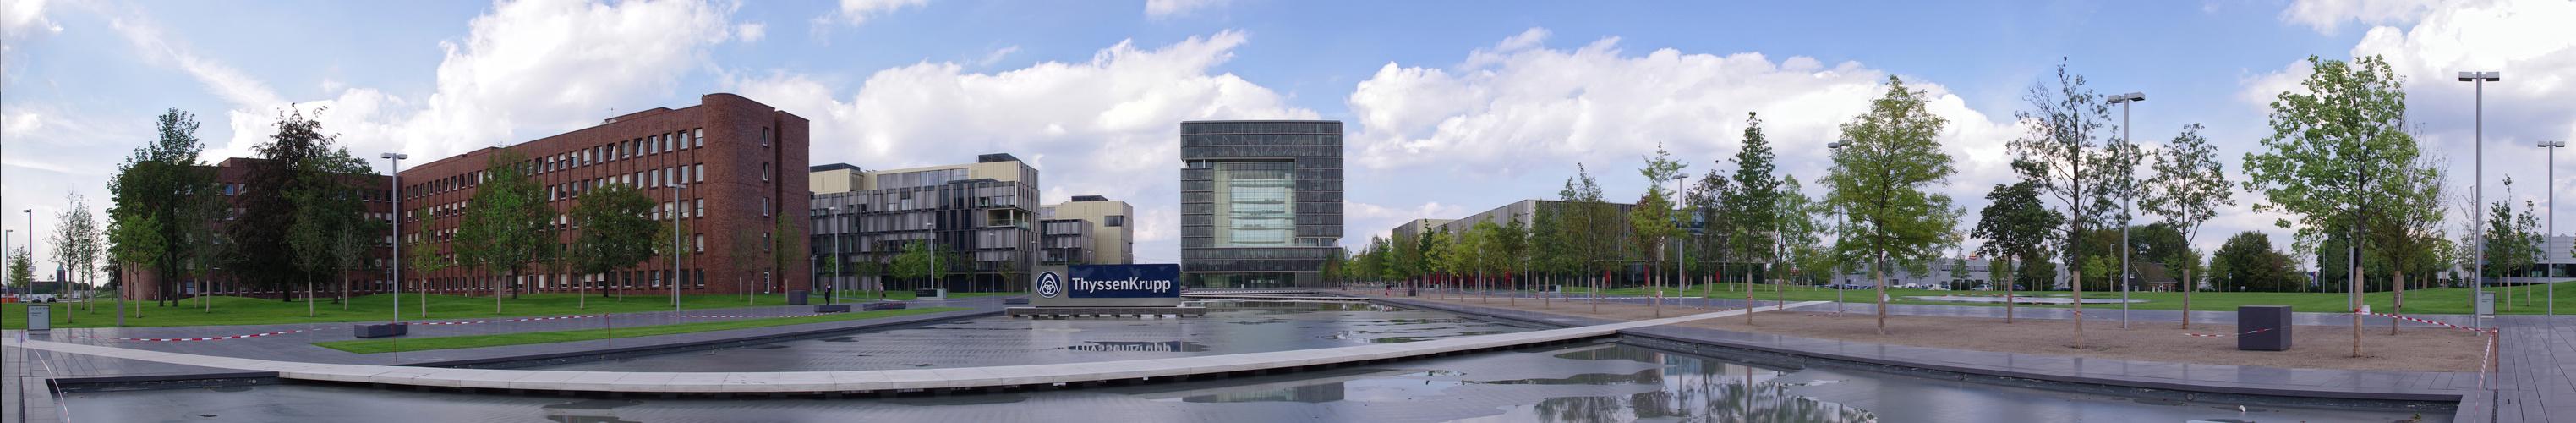 Krupp Quartier in Essen (1)